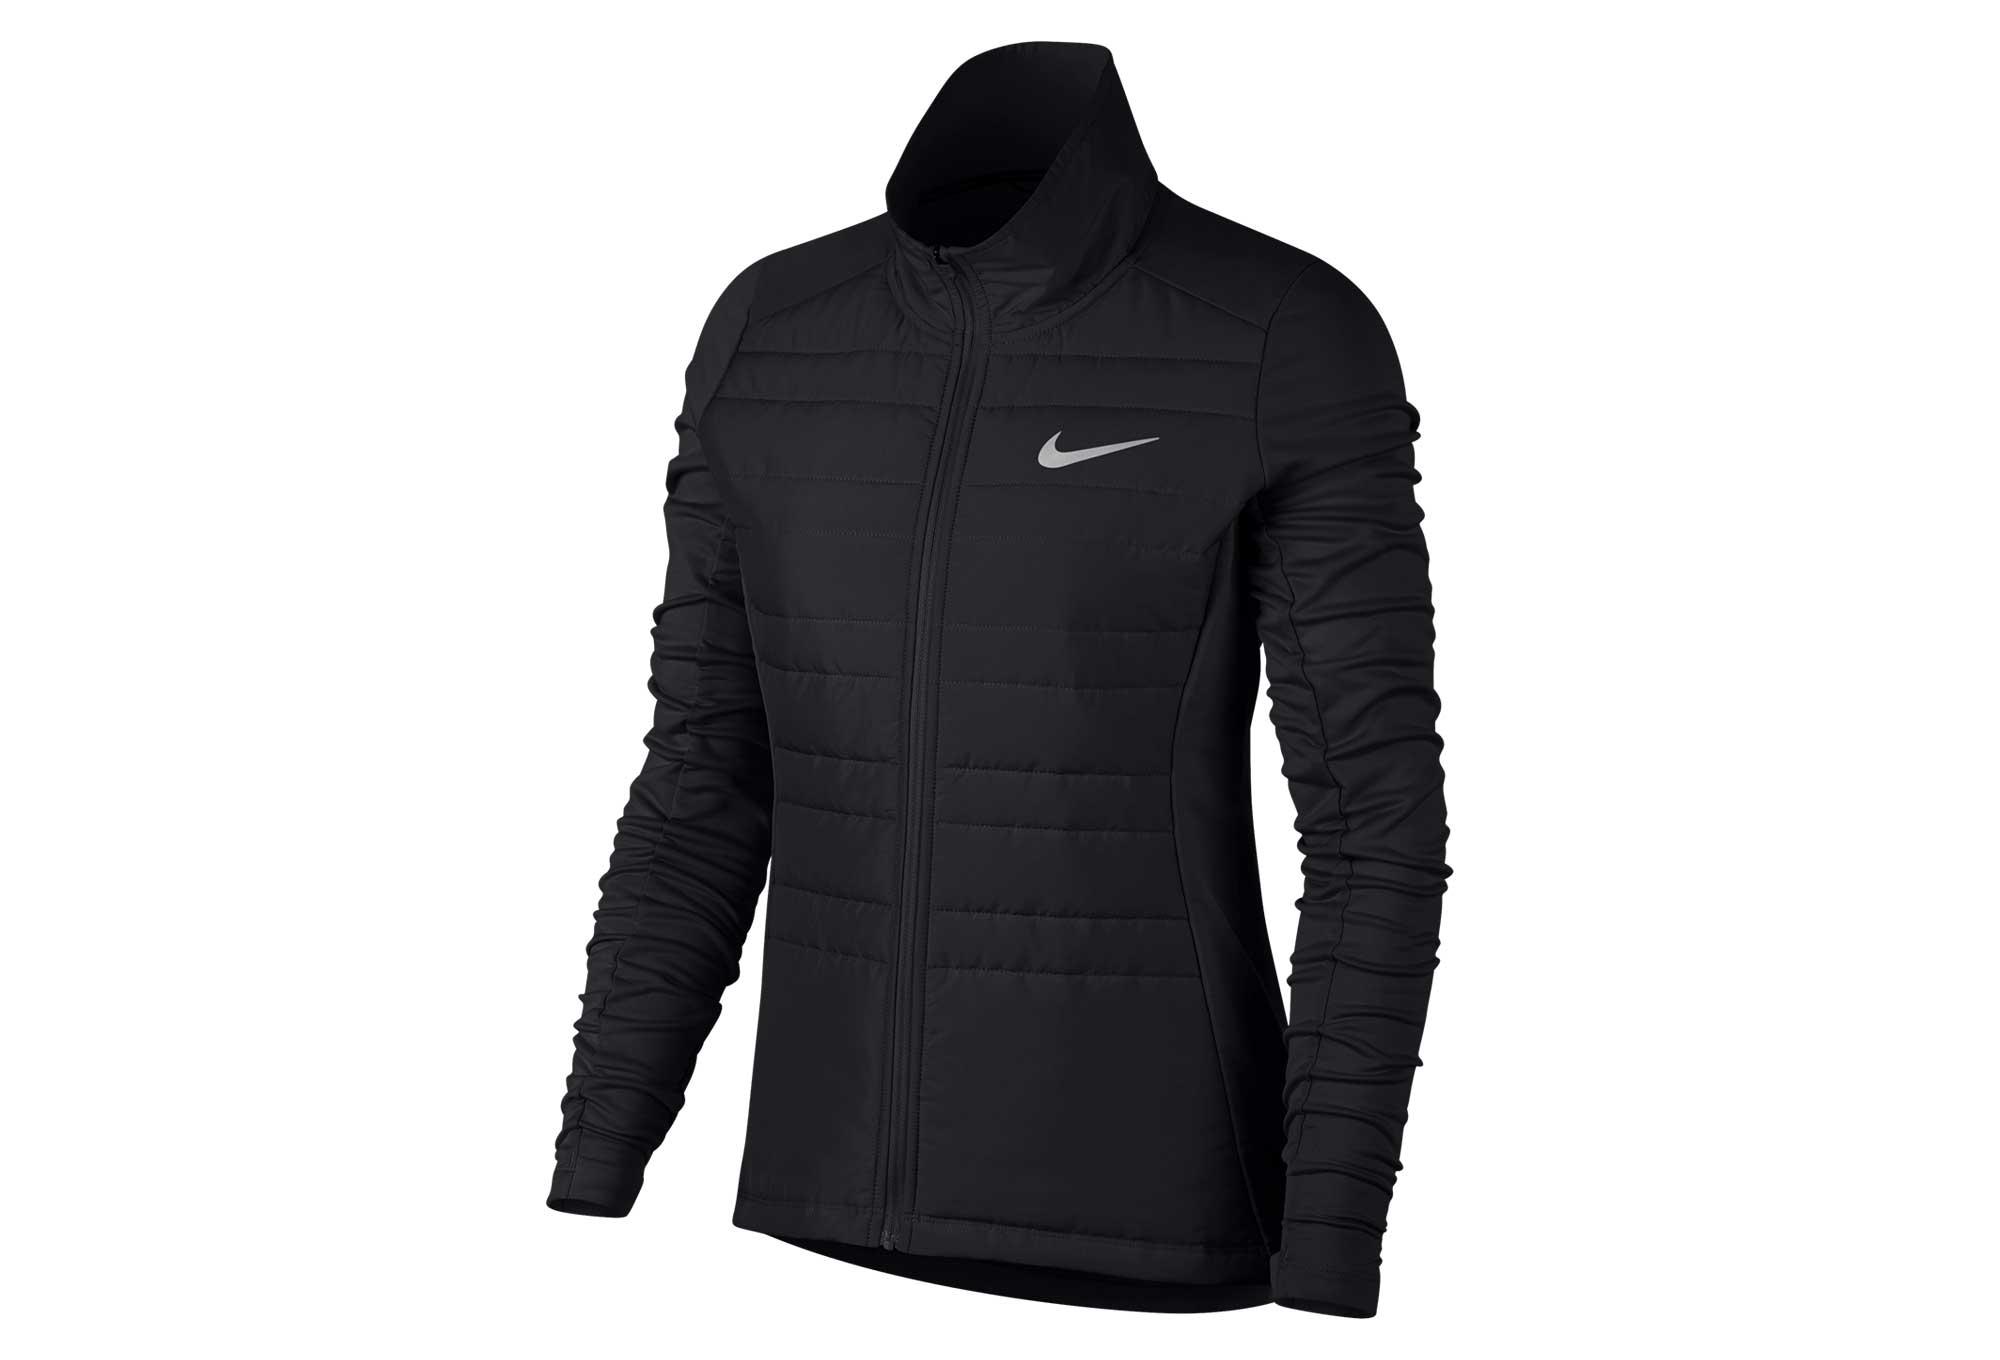 Femme Essential Nike Noir Filled Veste 5CwIzqv